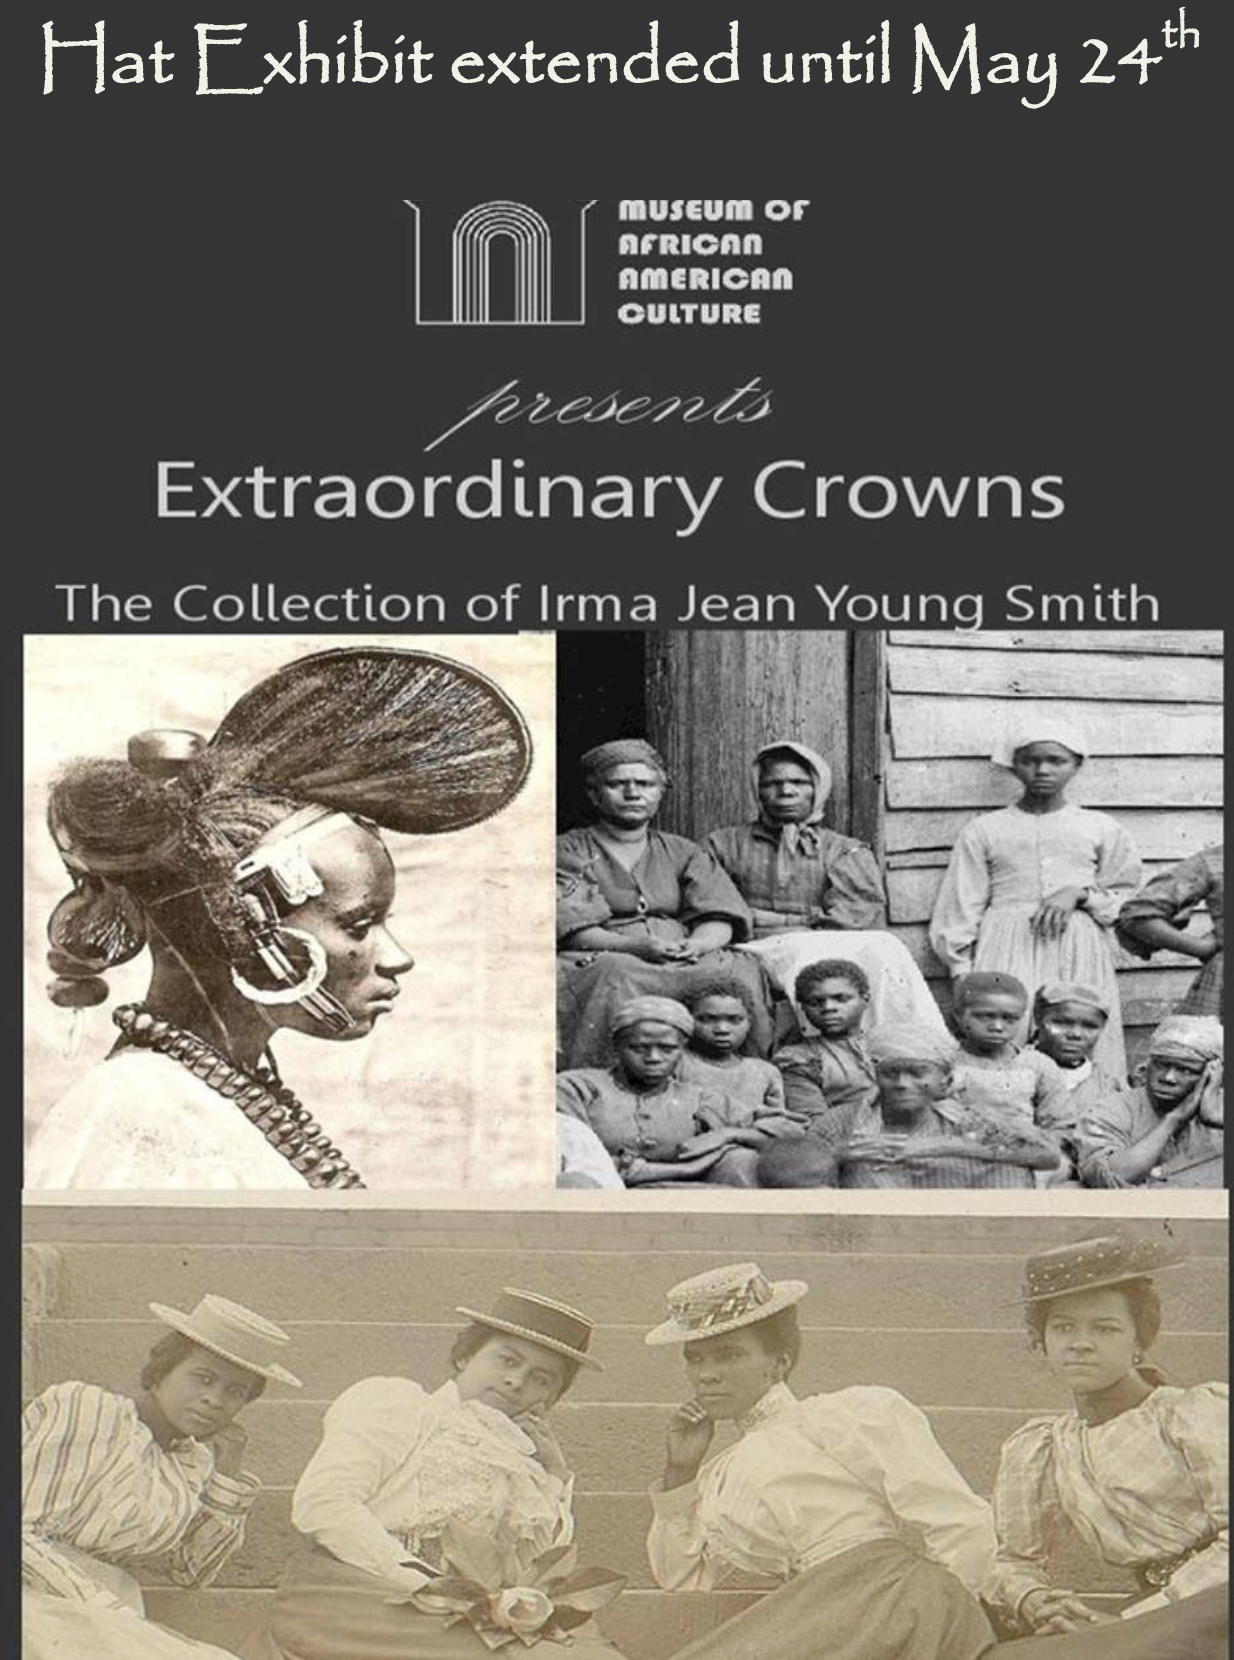 extraodinary_crowns